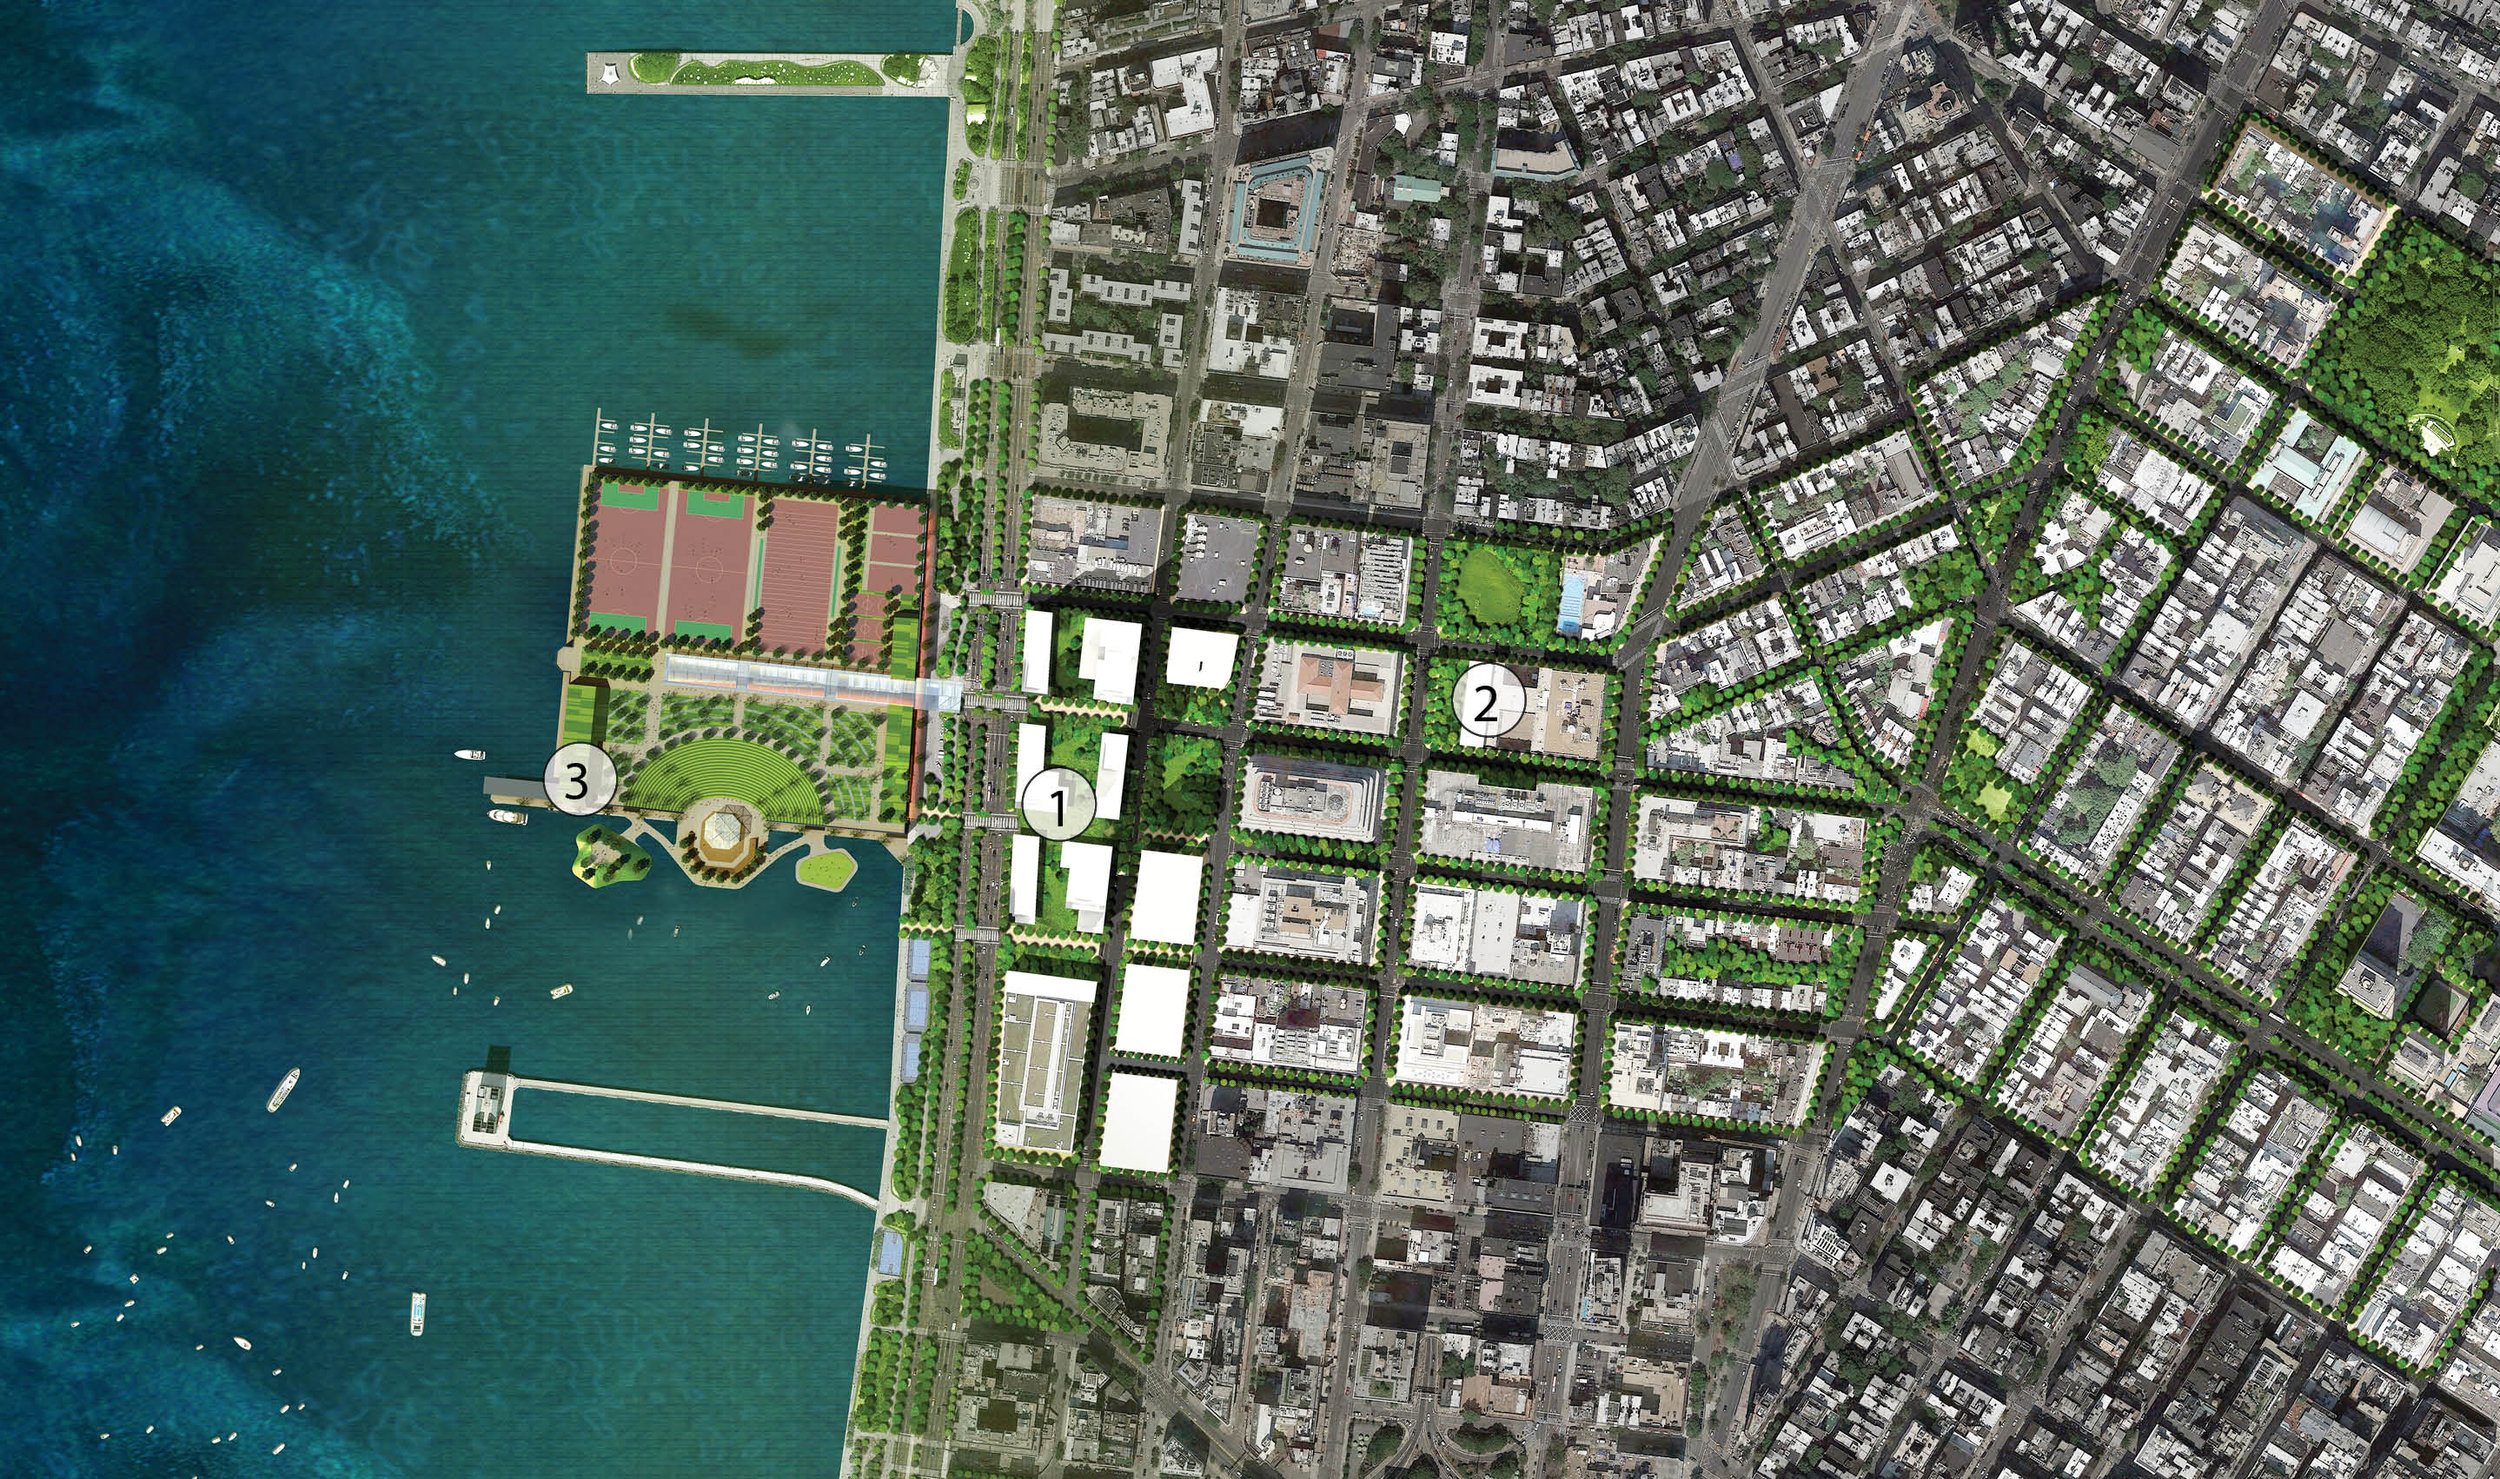 Plan for neighborhood.jpg